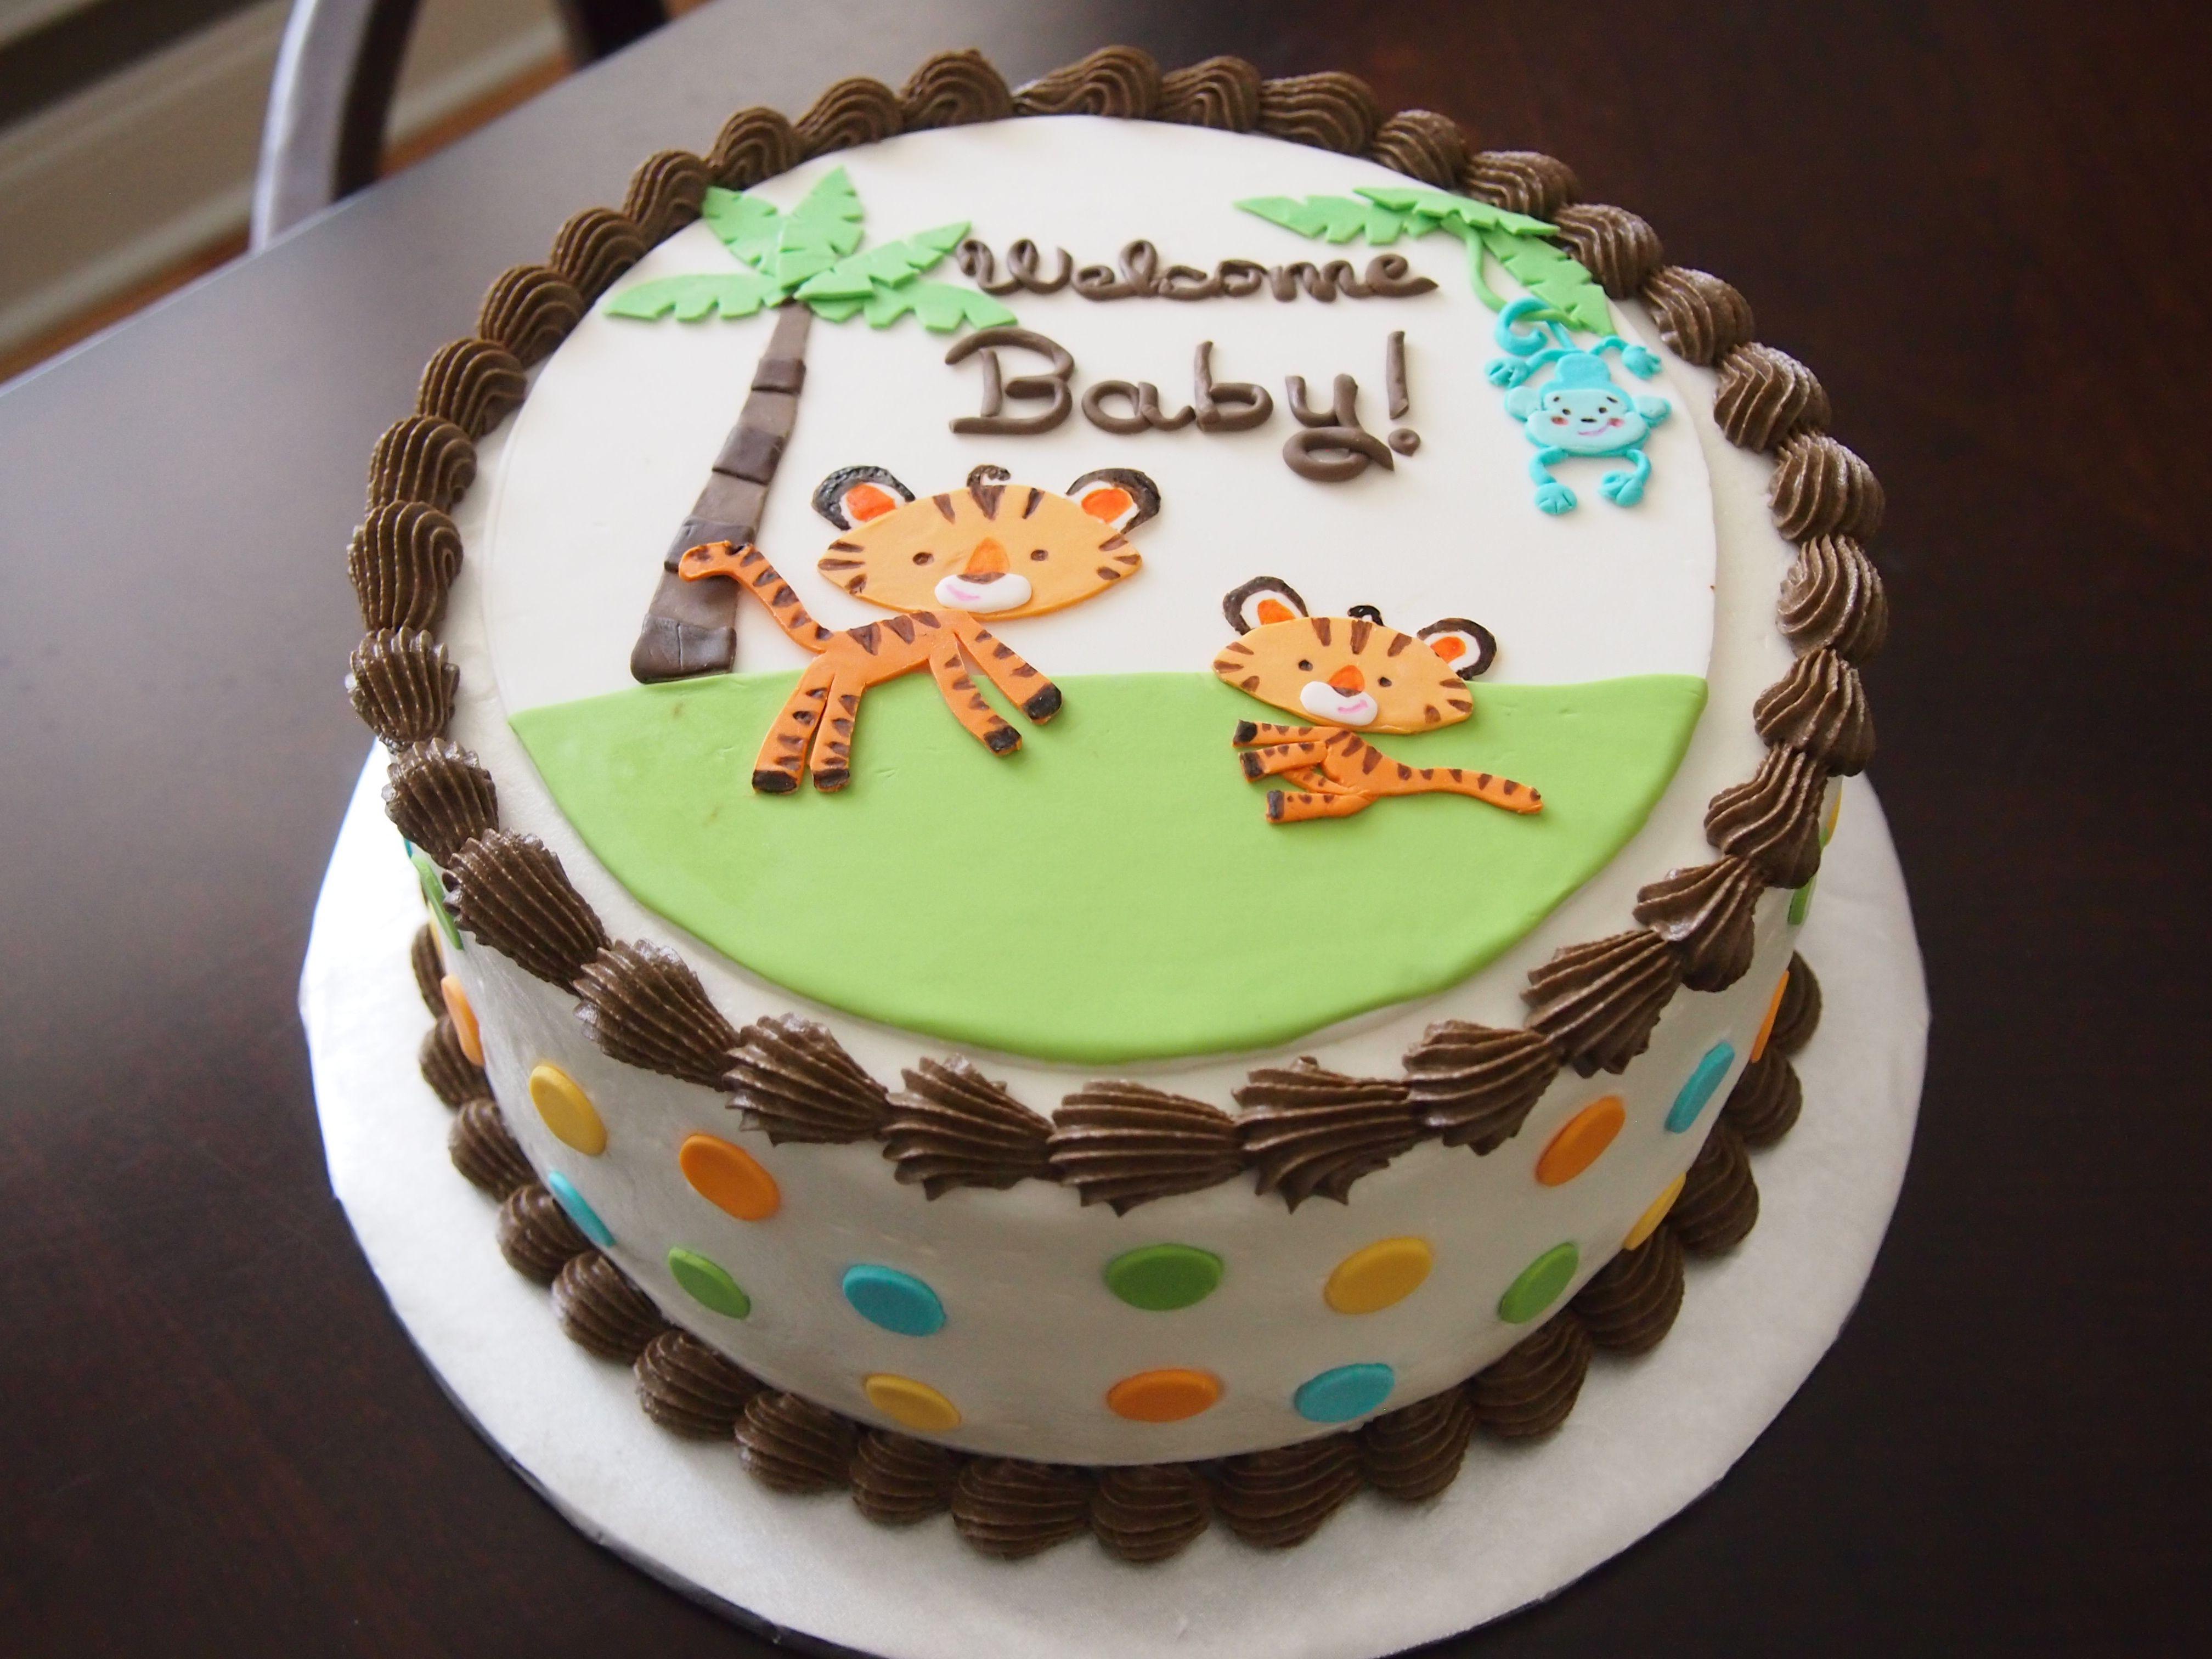 Fisher Price Rainforest Jungle Safari Baby Shower Cake